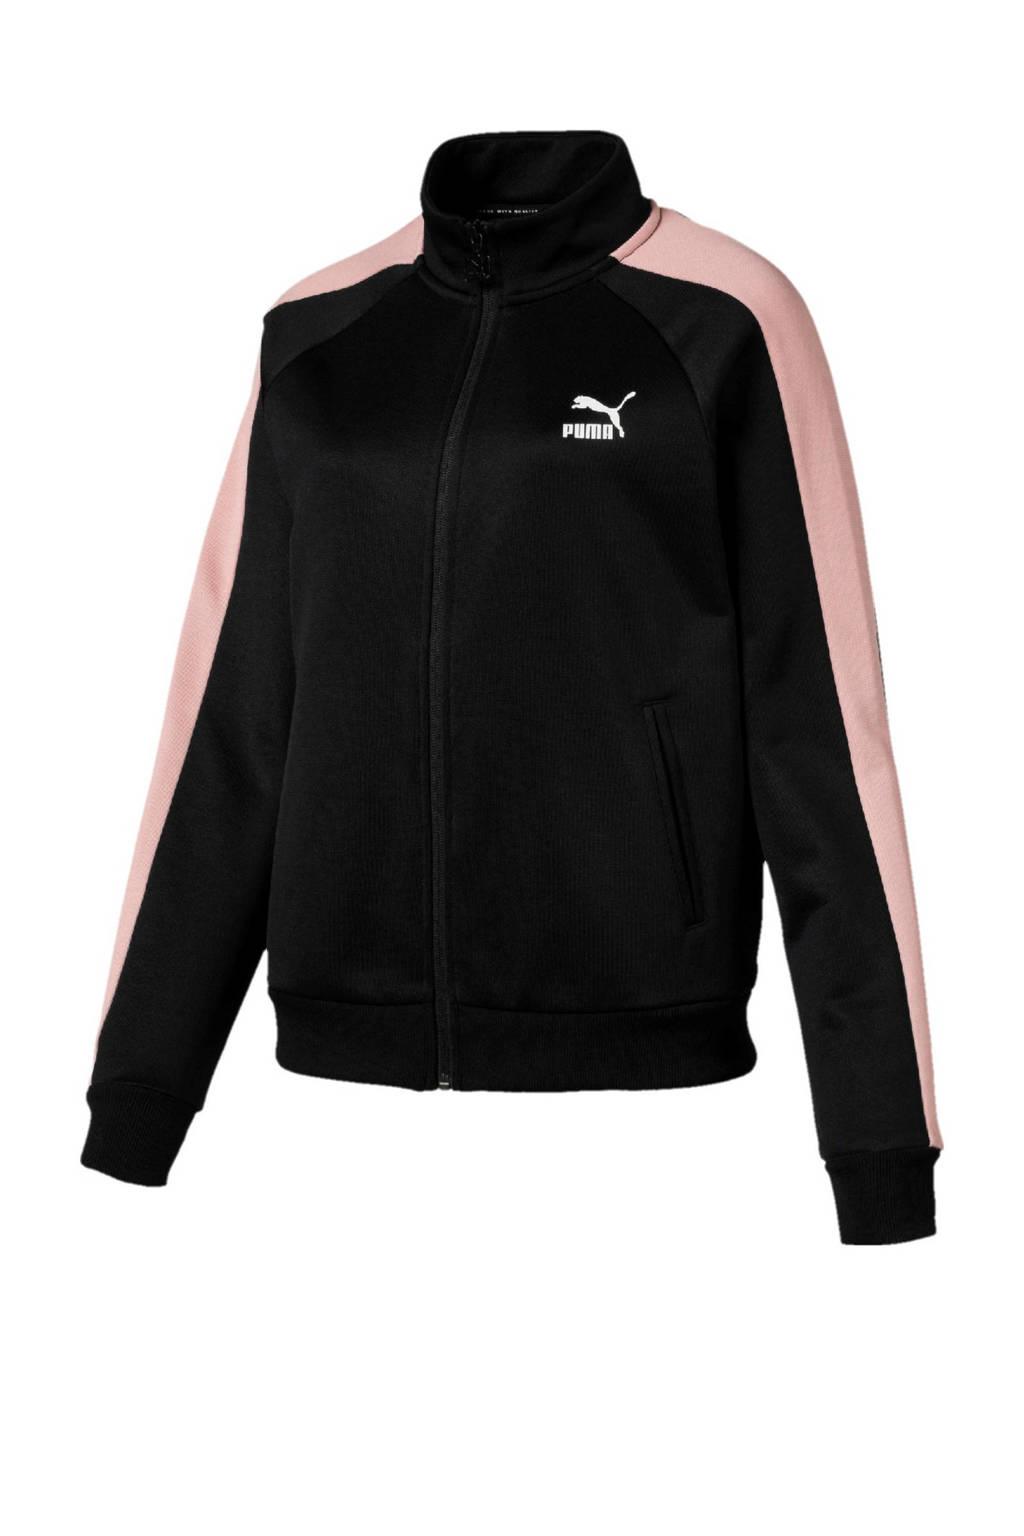 Puma vest zwart/roze, Zwart/roze